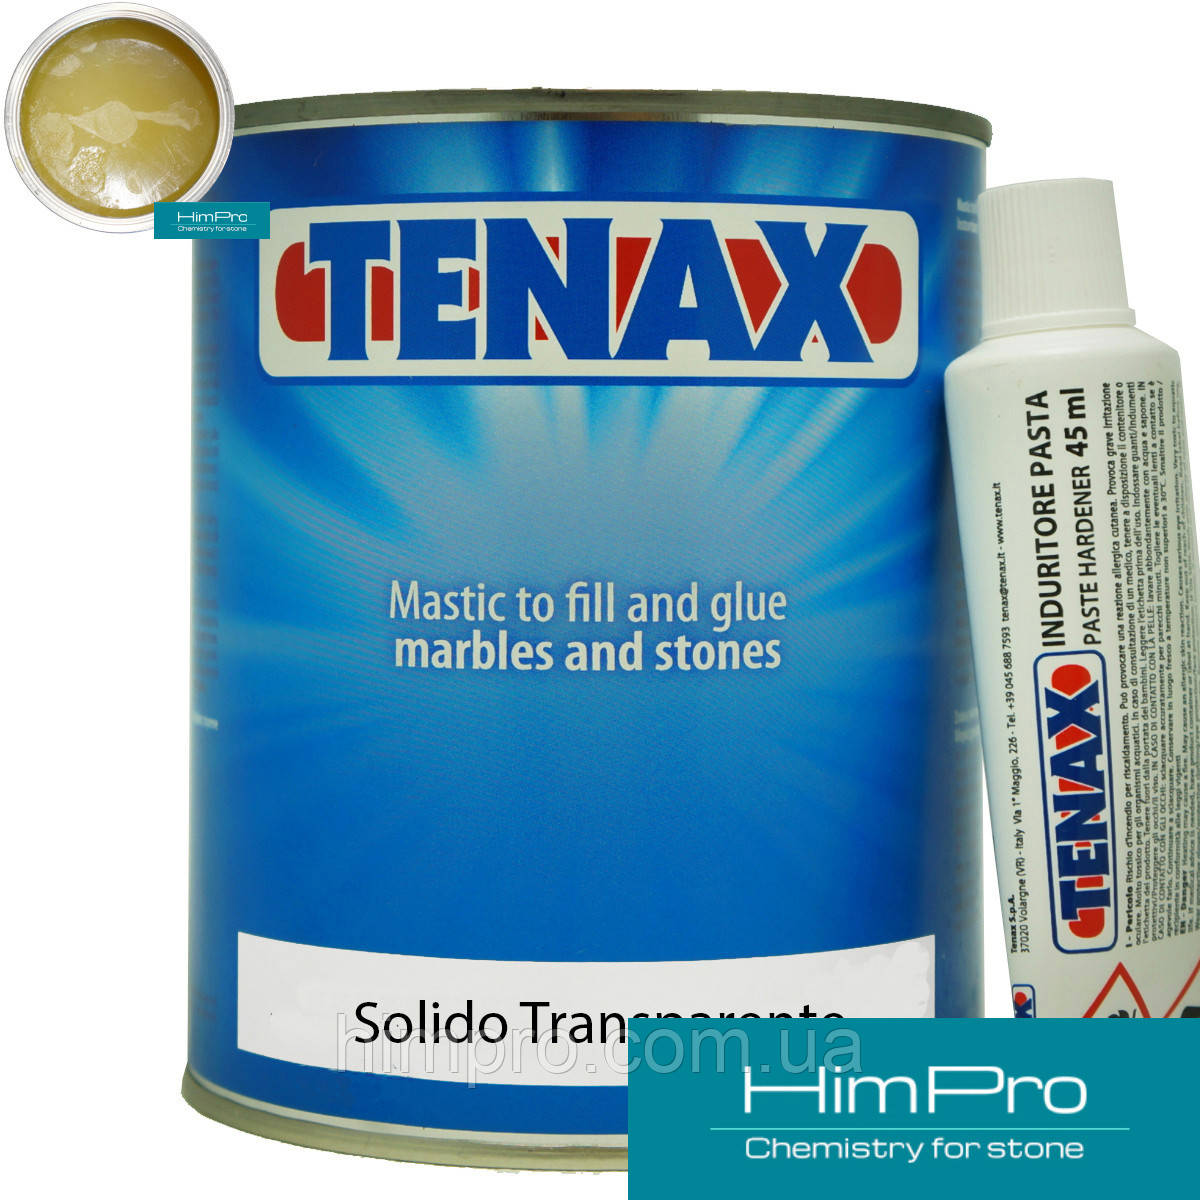 Solido Transparente 1L Tenax Поліефірний клей (медовий 1.1 кг)